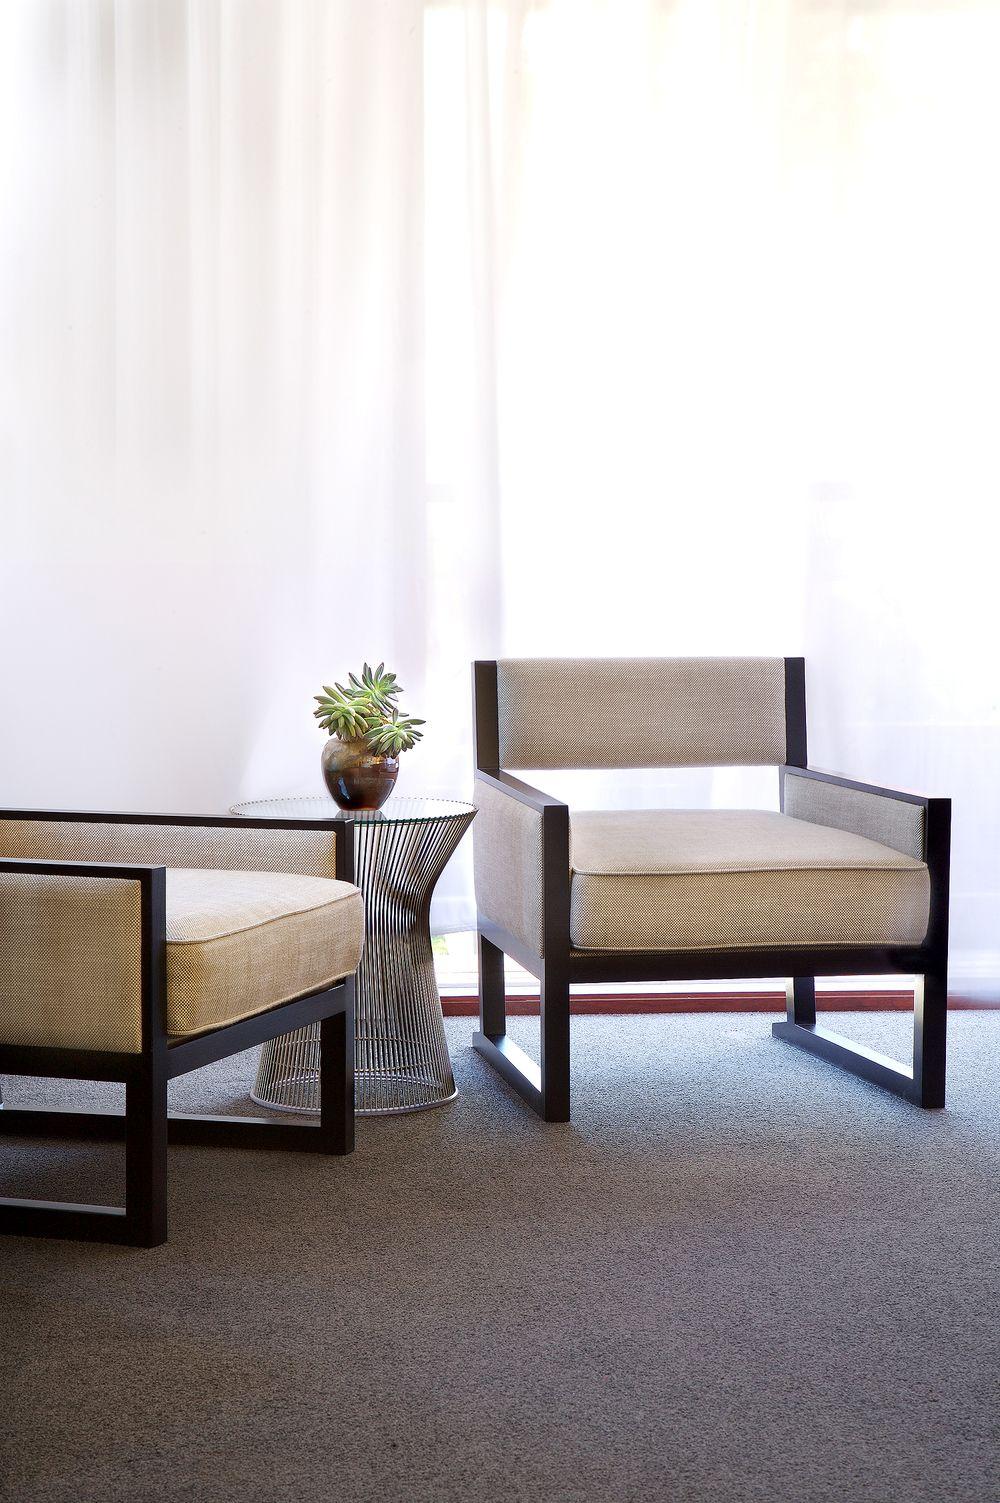 Balmoral Residence Interior Design Brisbane Queensland Australia